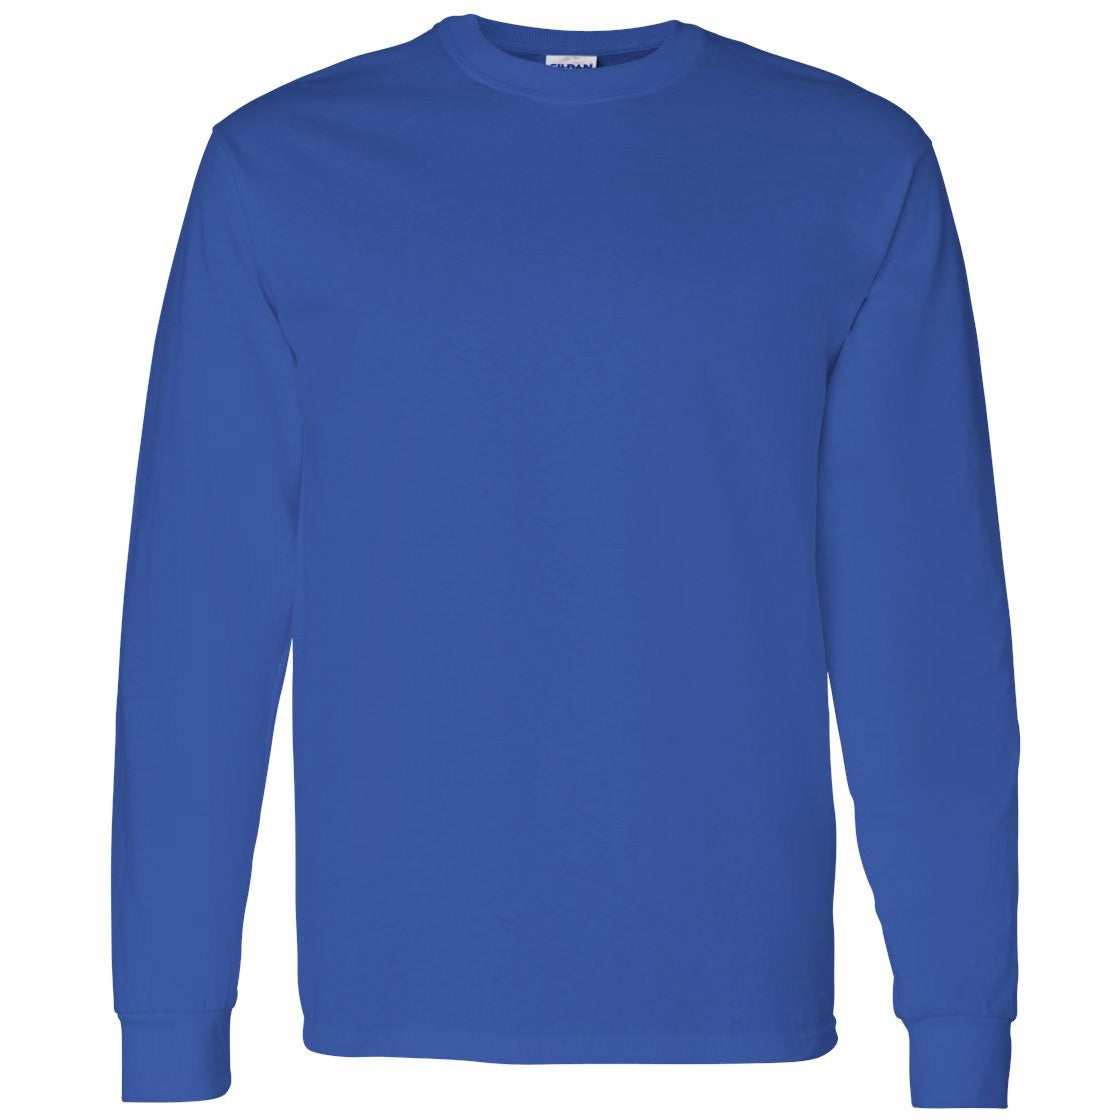 Promotional colors gildan heavy cotton long sleeve t for Custom screen print t shirts no minimum